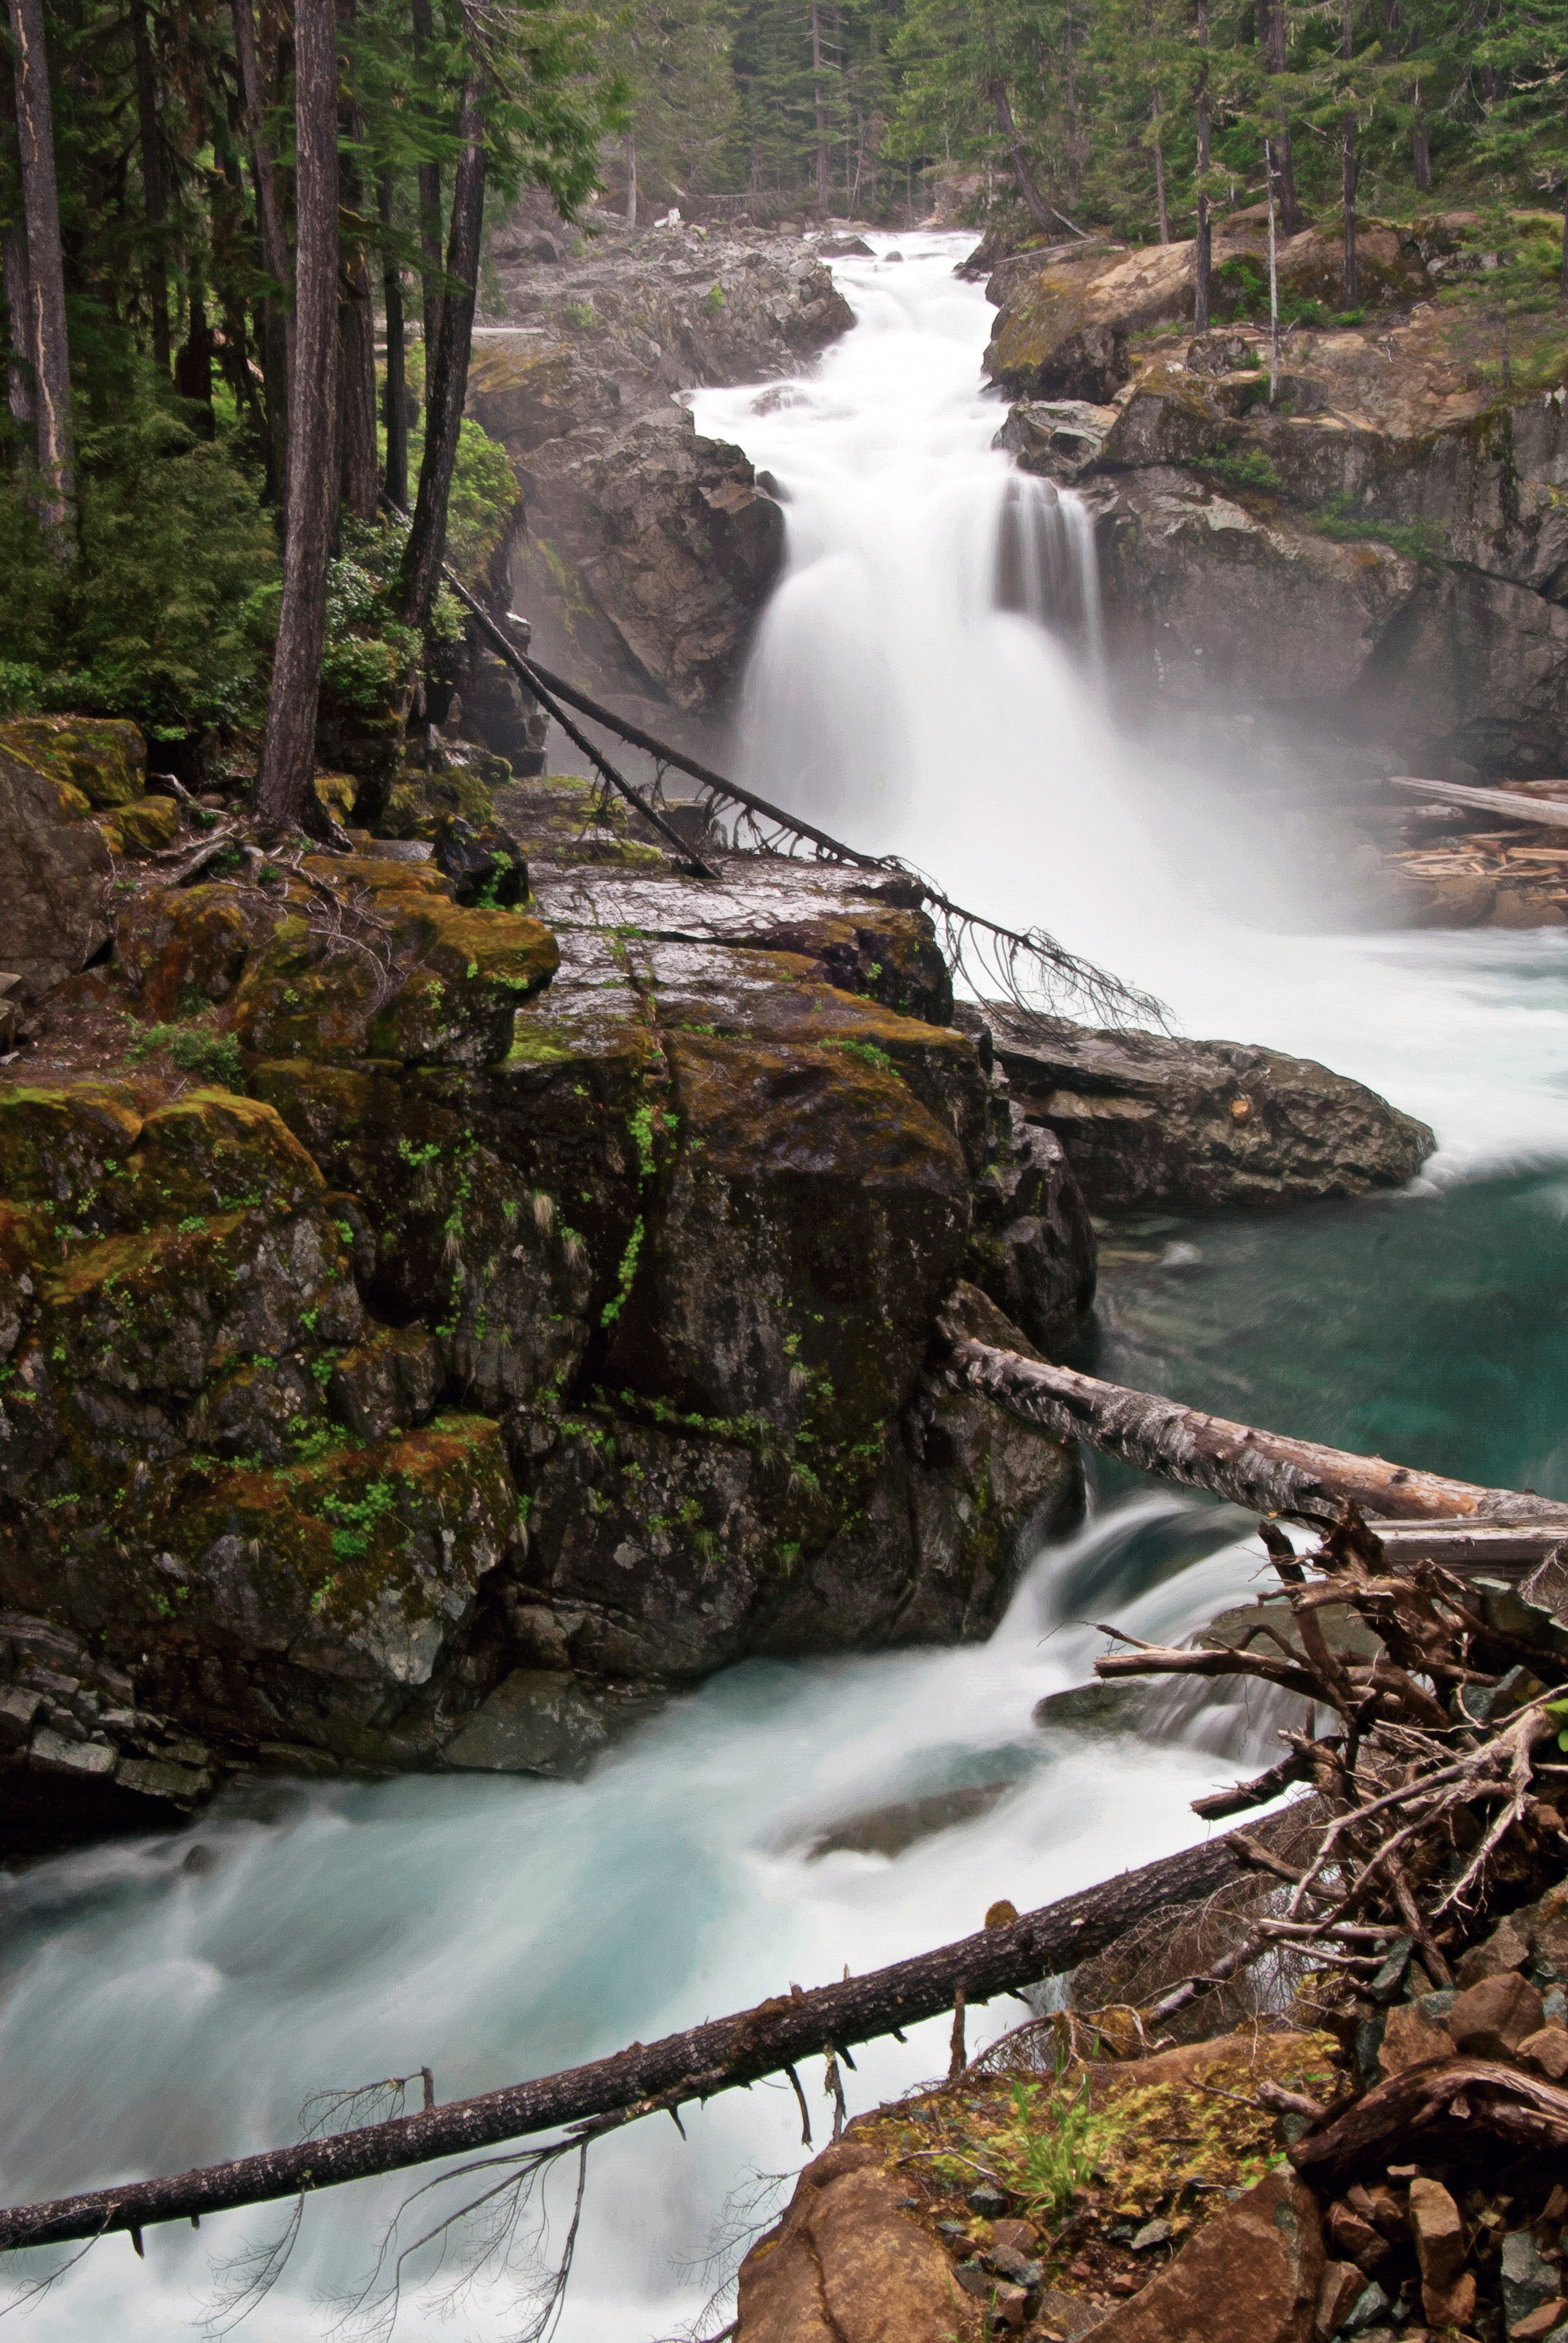 silver falls by doug s